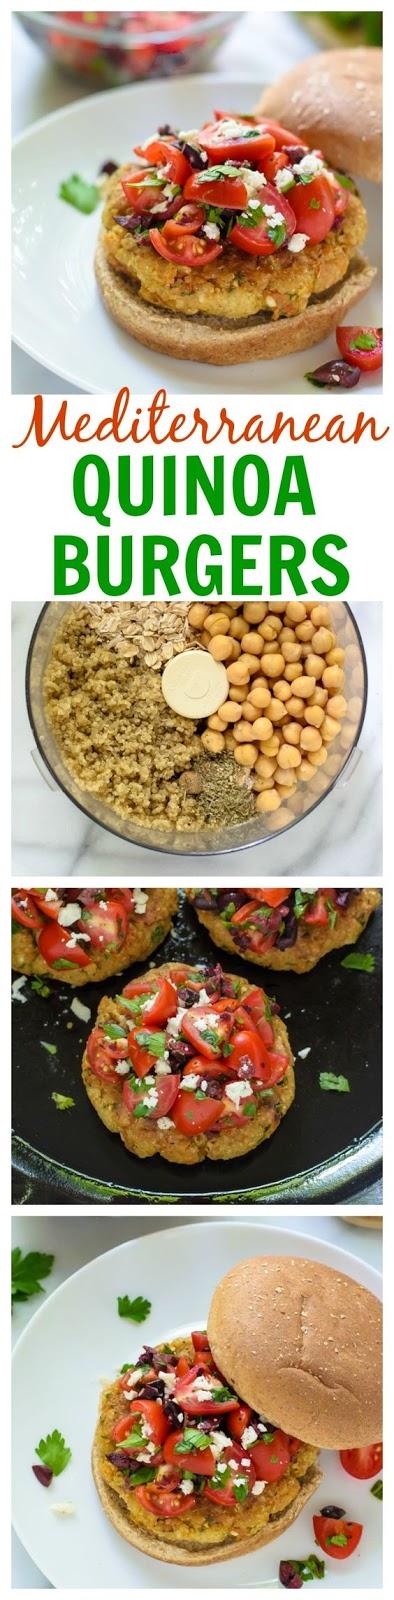 Mediterranean Quinoa Burger with Sun-Dried Tomatoes and Feta